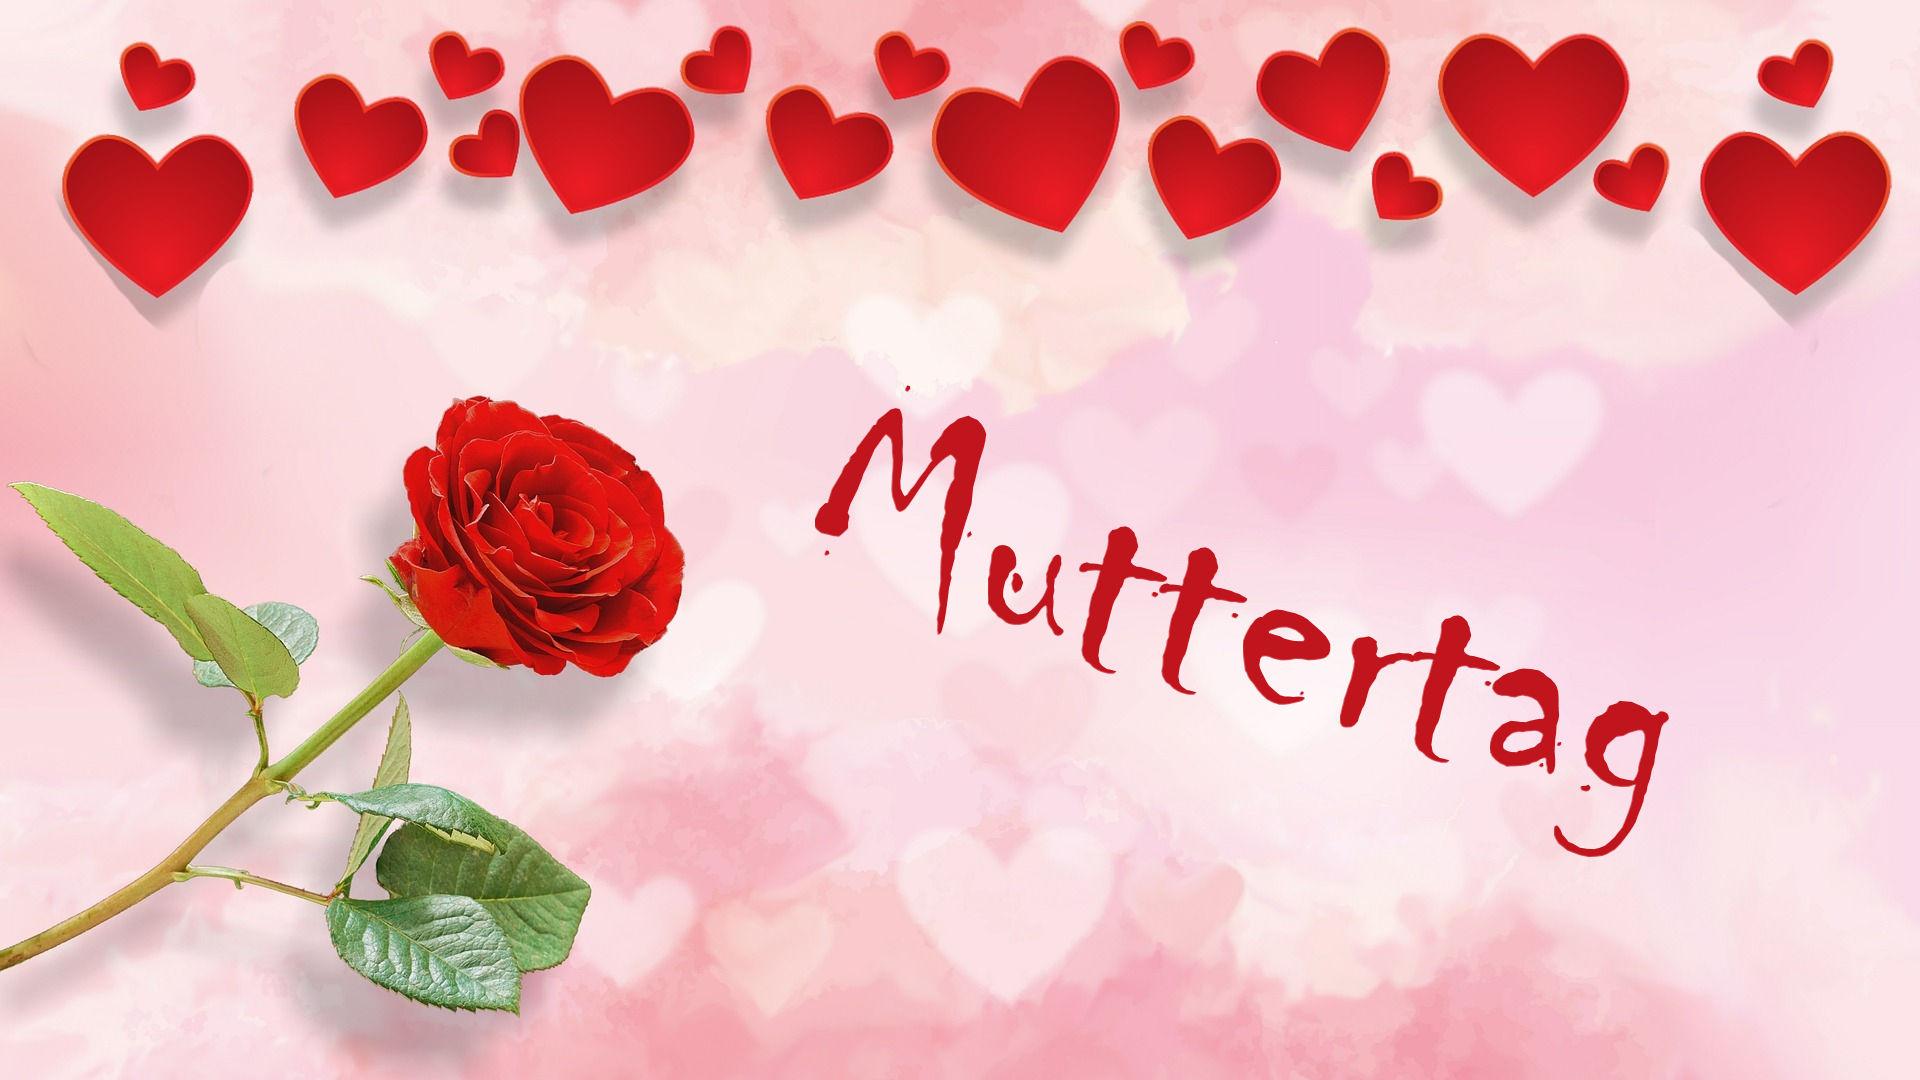 Am 9. Mai ist Muttertag!